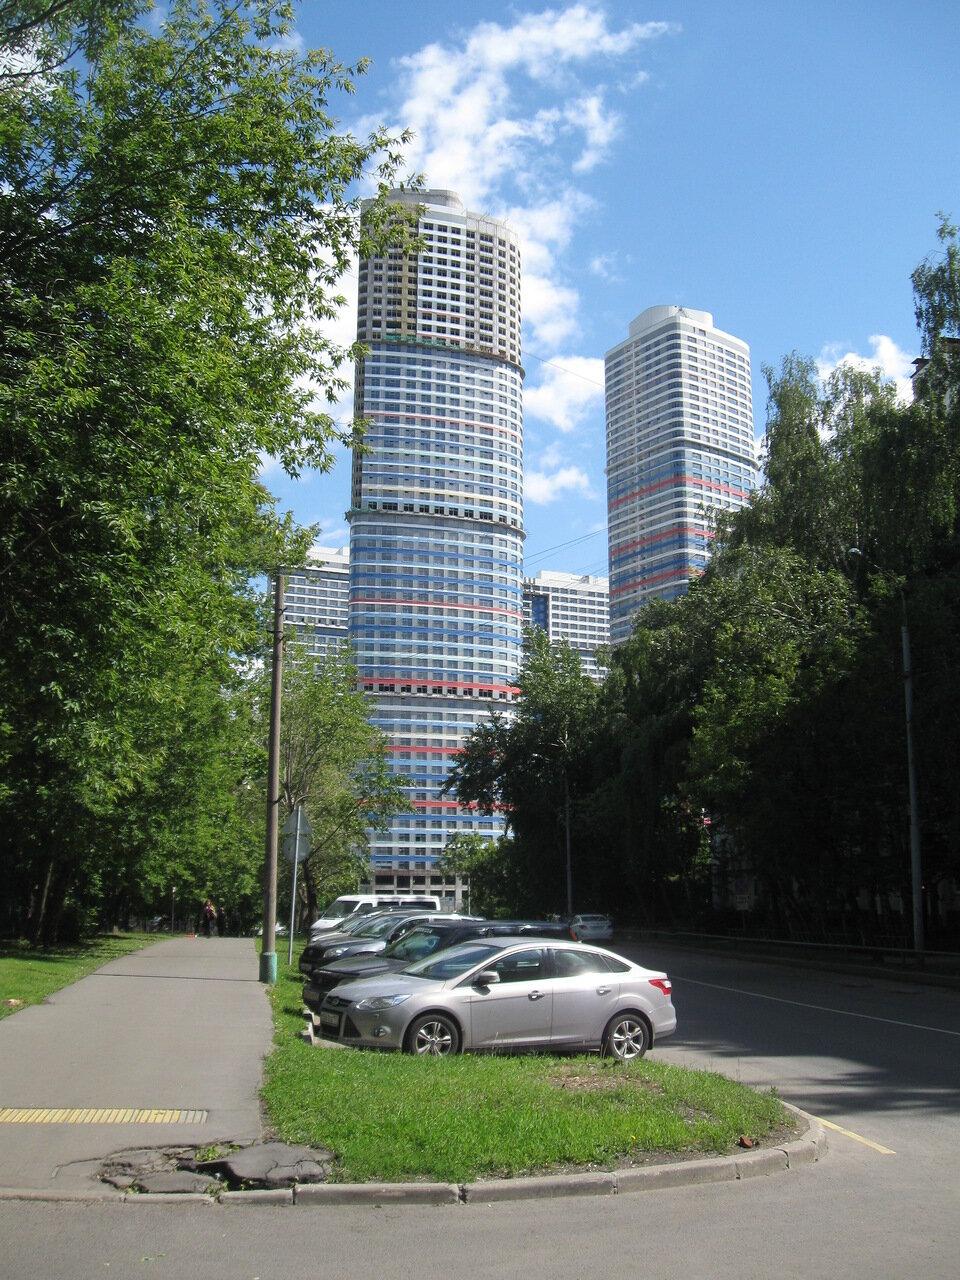 http://img-fotki.yandex.ru/get/9811/211030028.0/0_e8ce2_f01e7427_XXXL.jpg